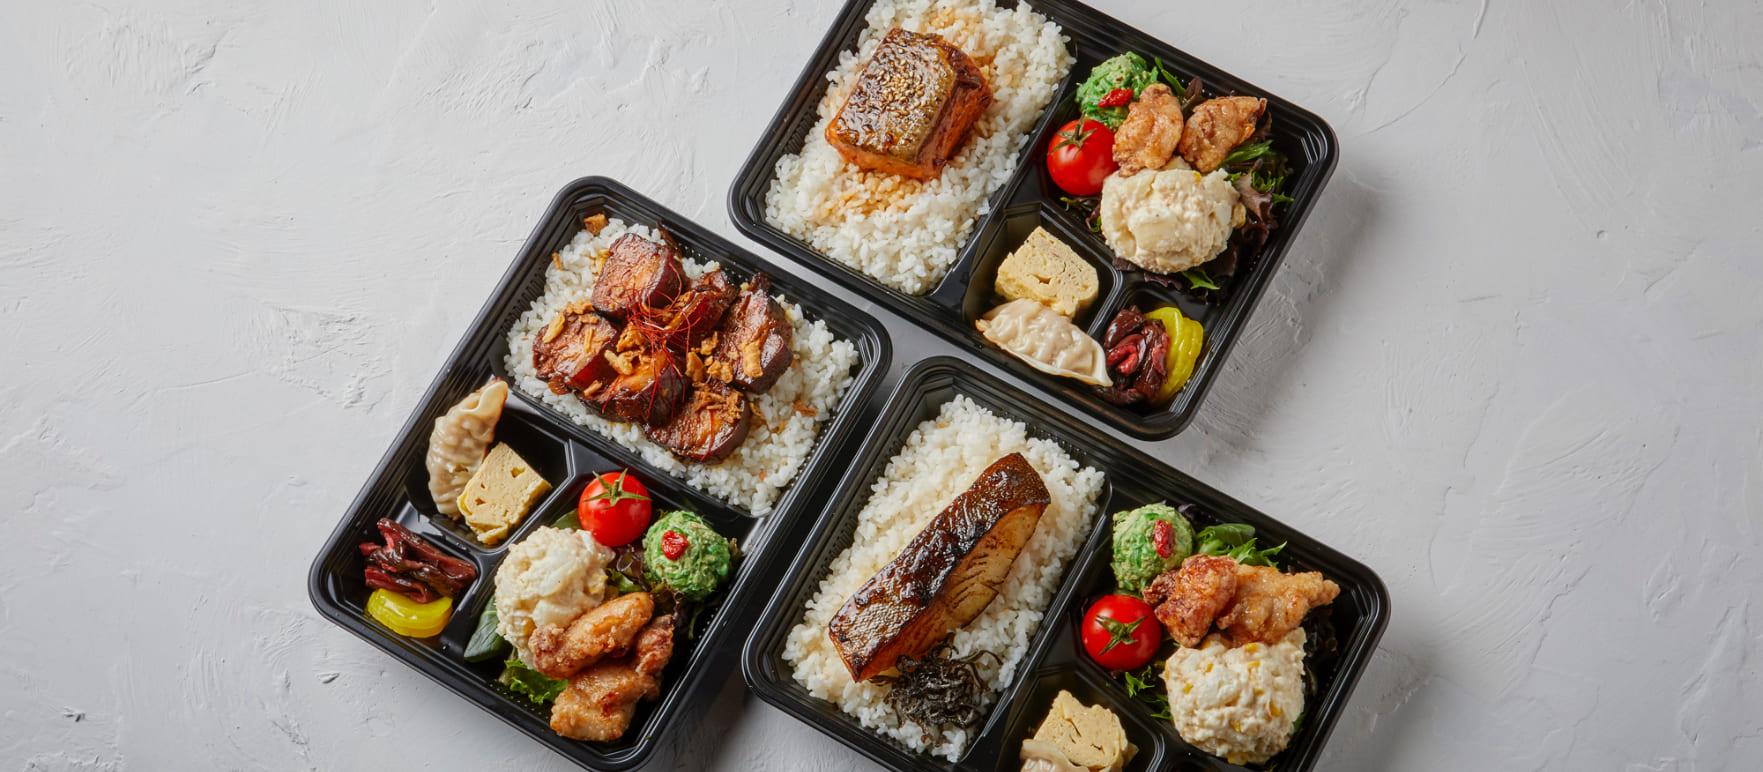 komeyui's japanese bento boxes